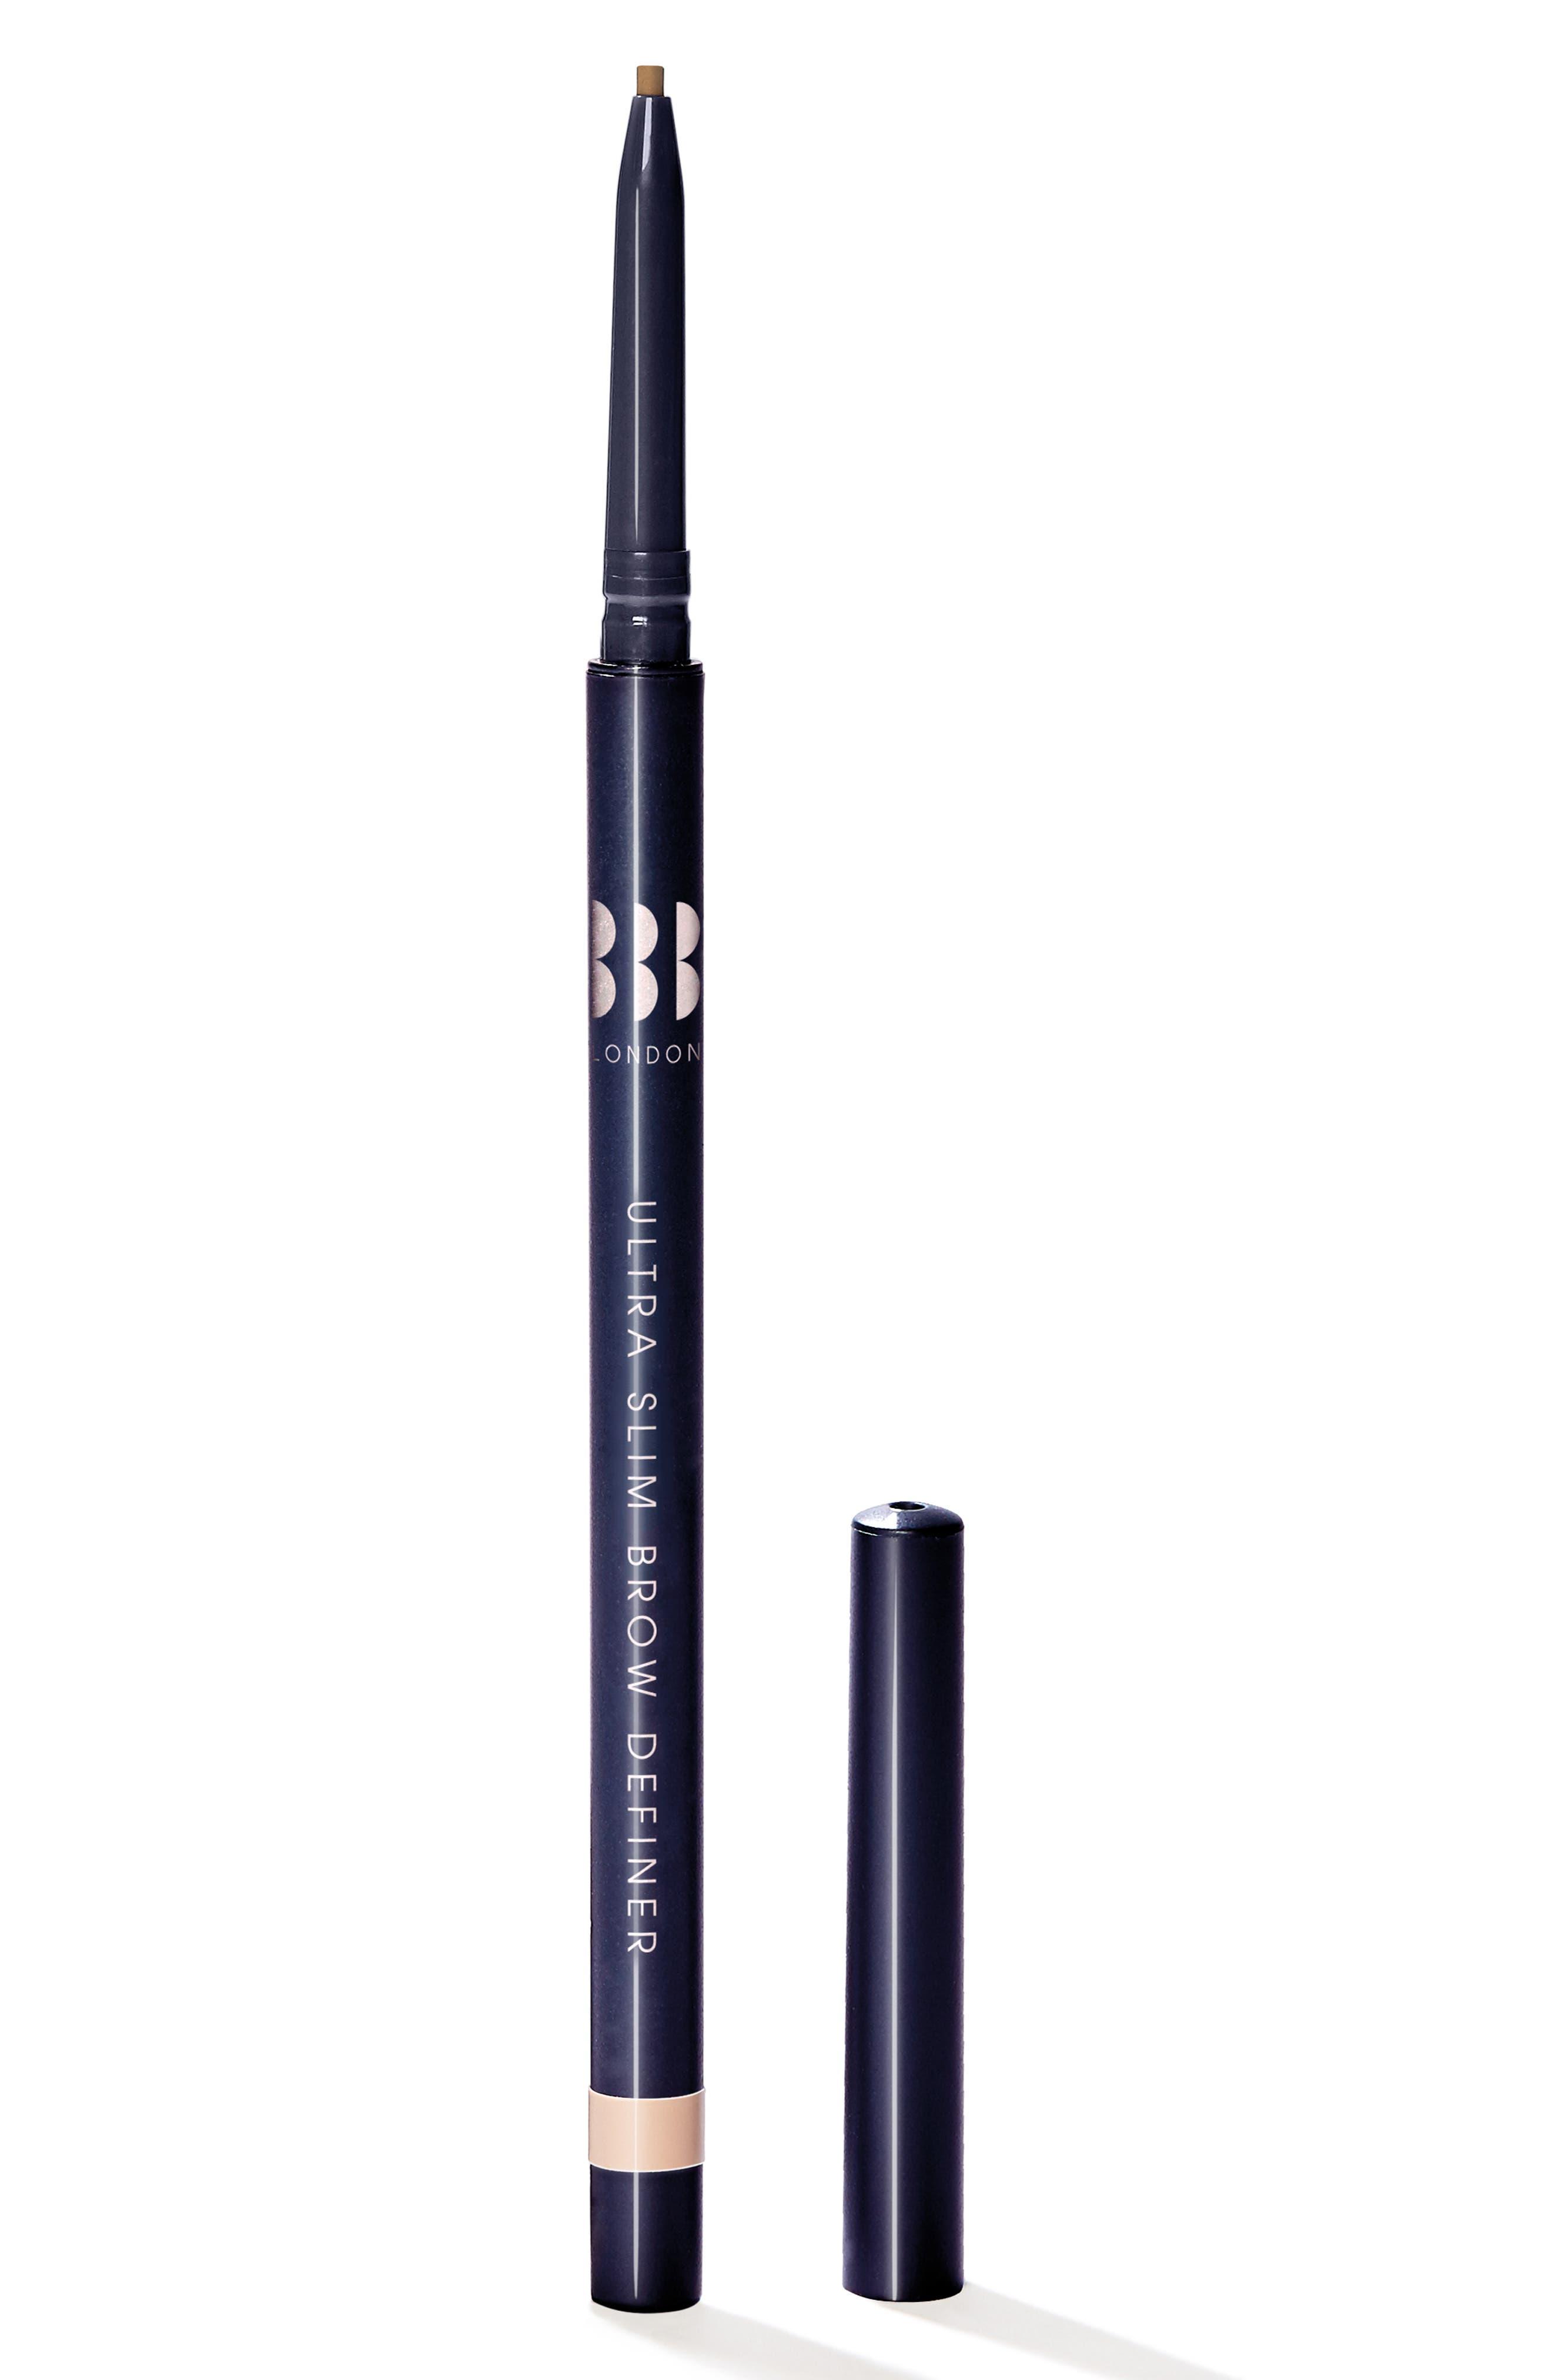 BBB London Ultra Slim Brow Definer Eyebrow Pencil in Cardamom at Nordstrom